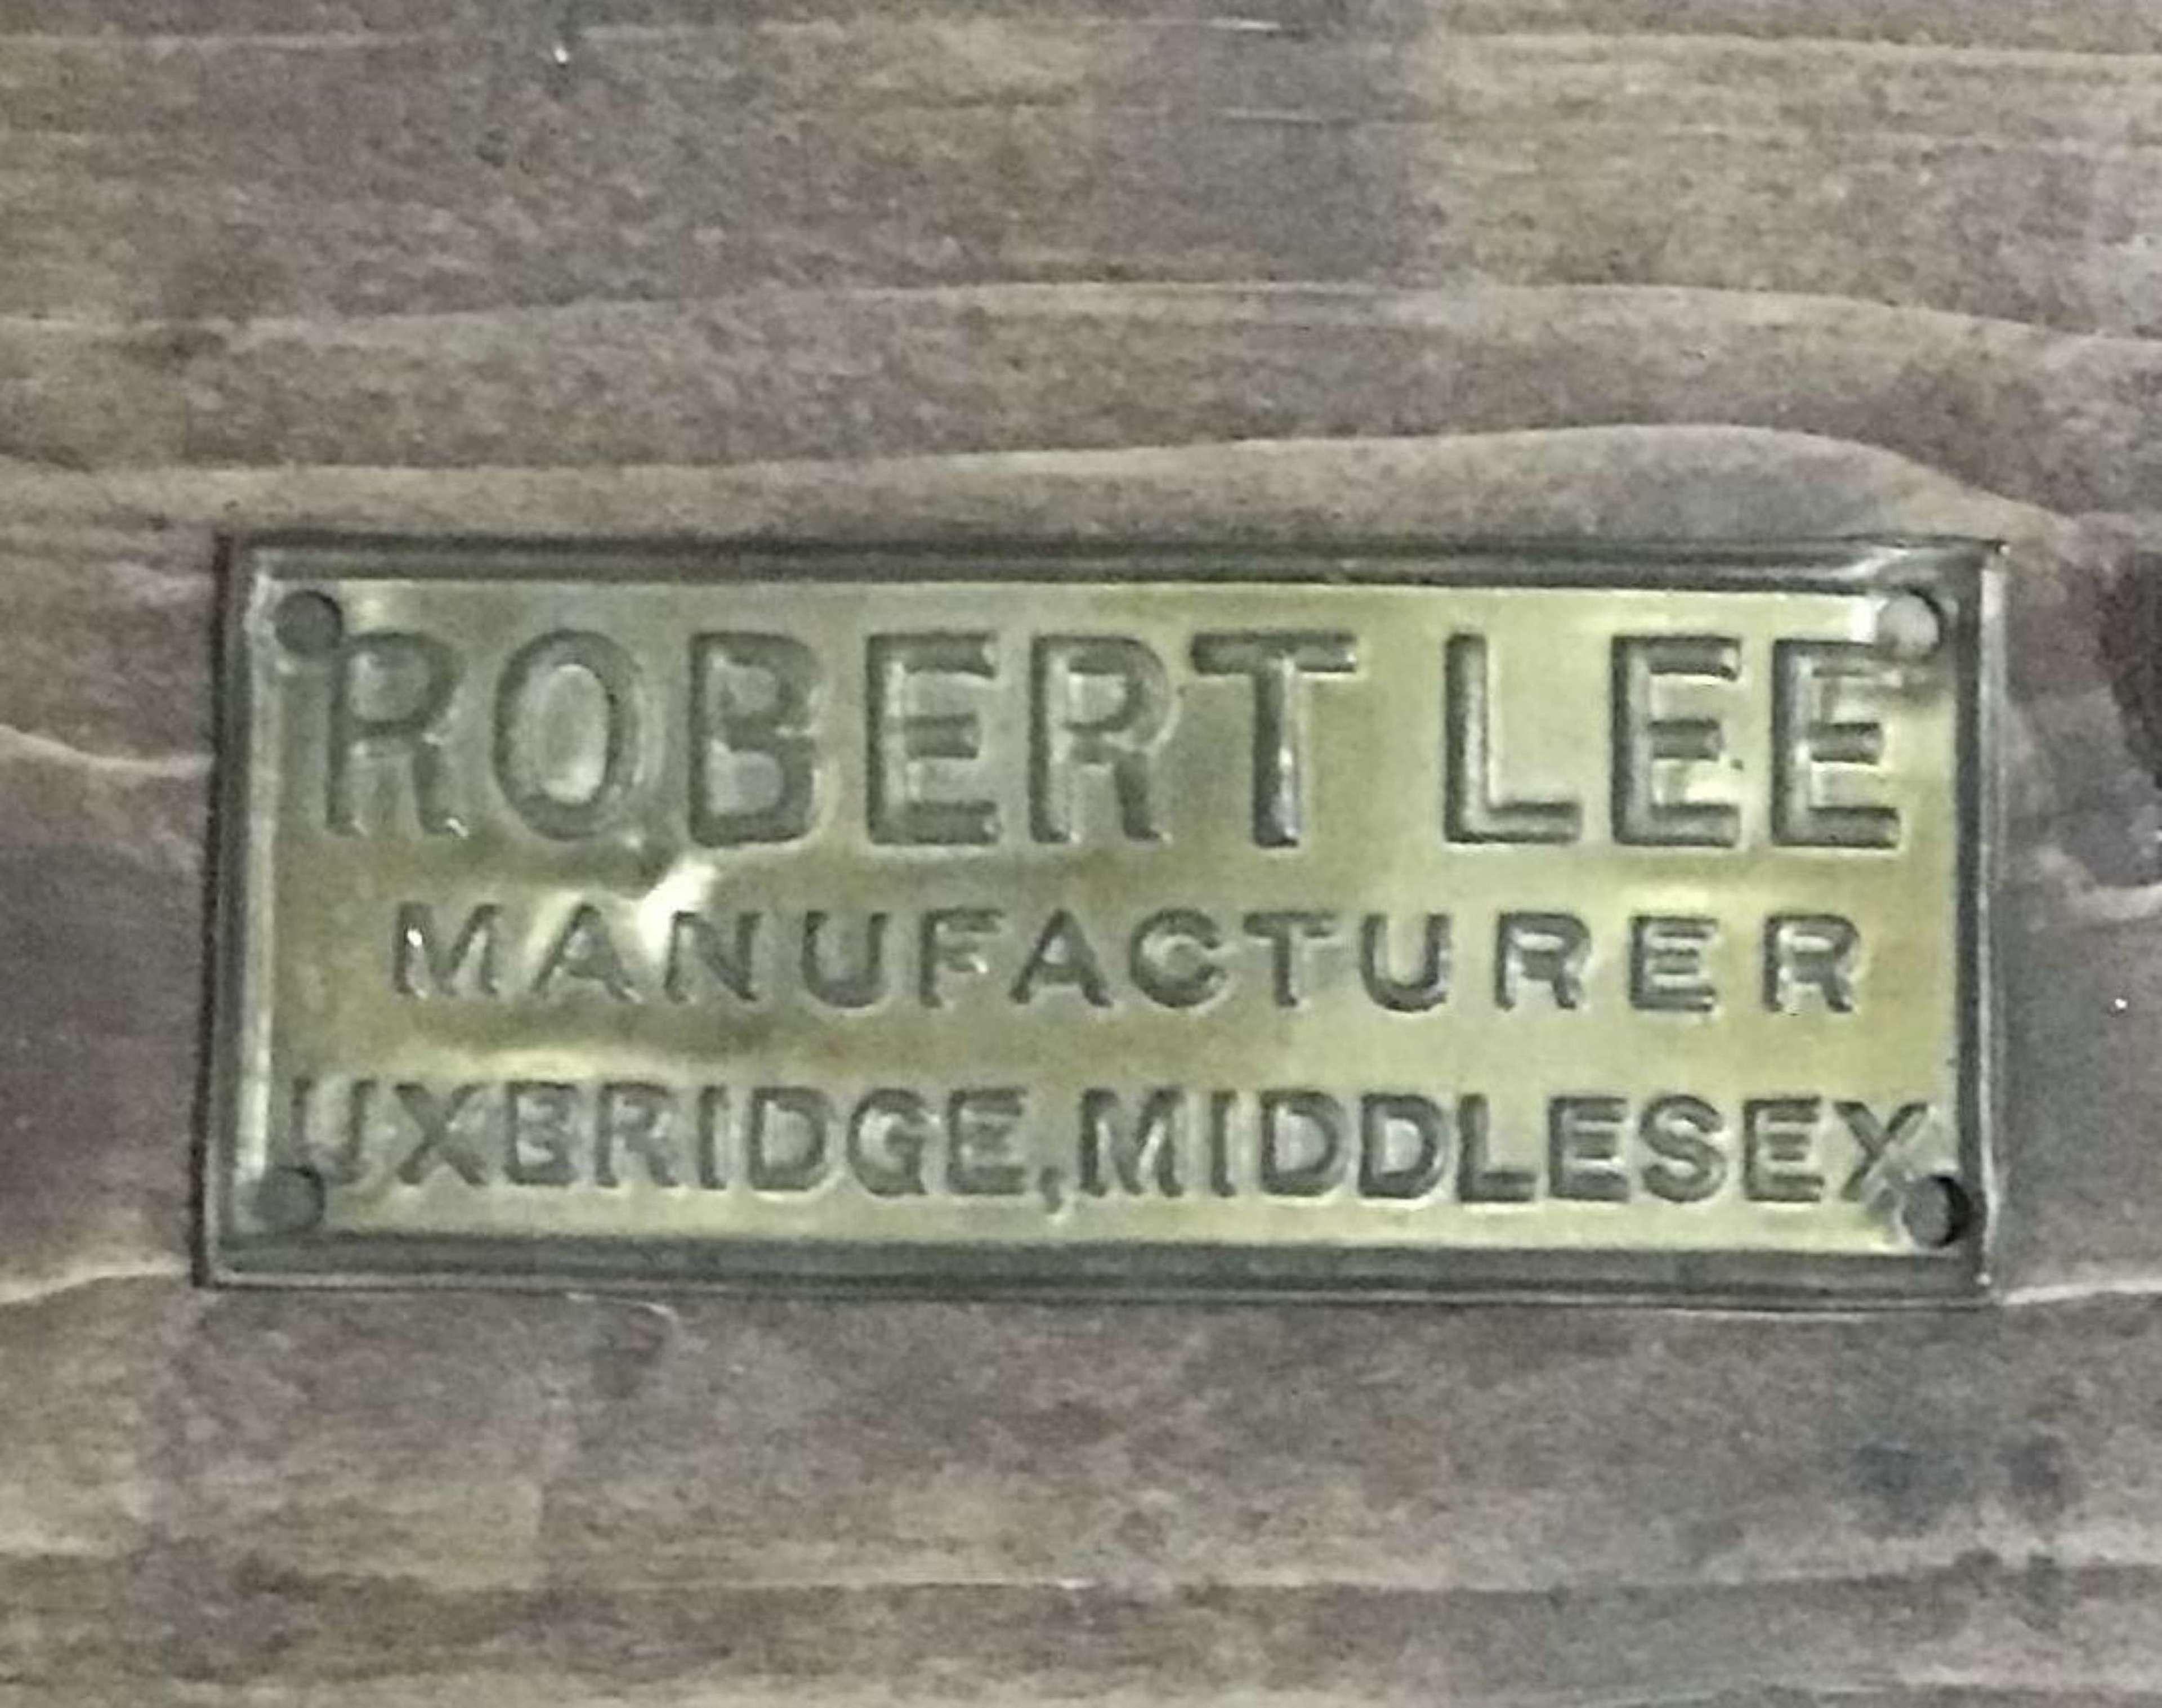 Brass Manufacturers Label for Robert Lee of Uxbridge Middlesex